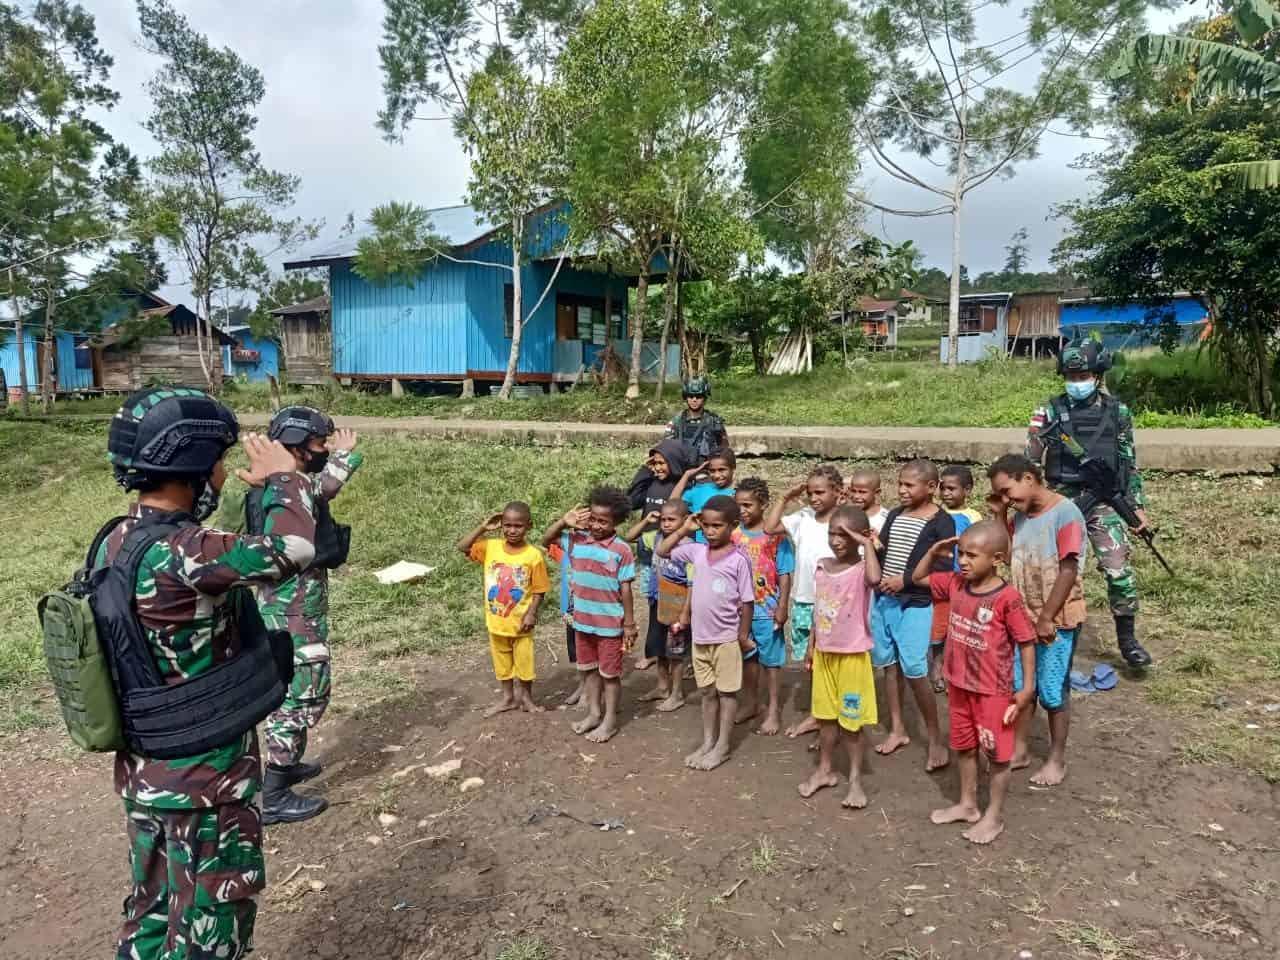 Isi Liburan Sekolah, Satgas Yonif 403 Latih Anak Perbatasan Baris Berbaris